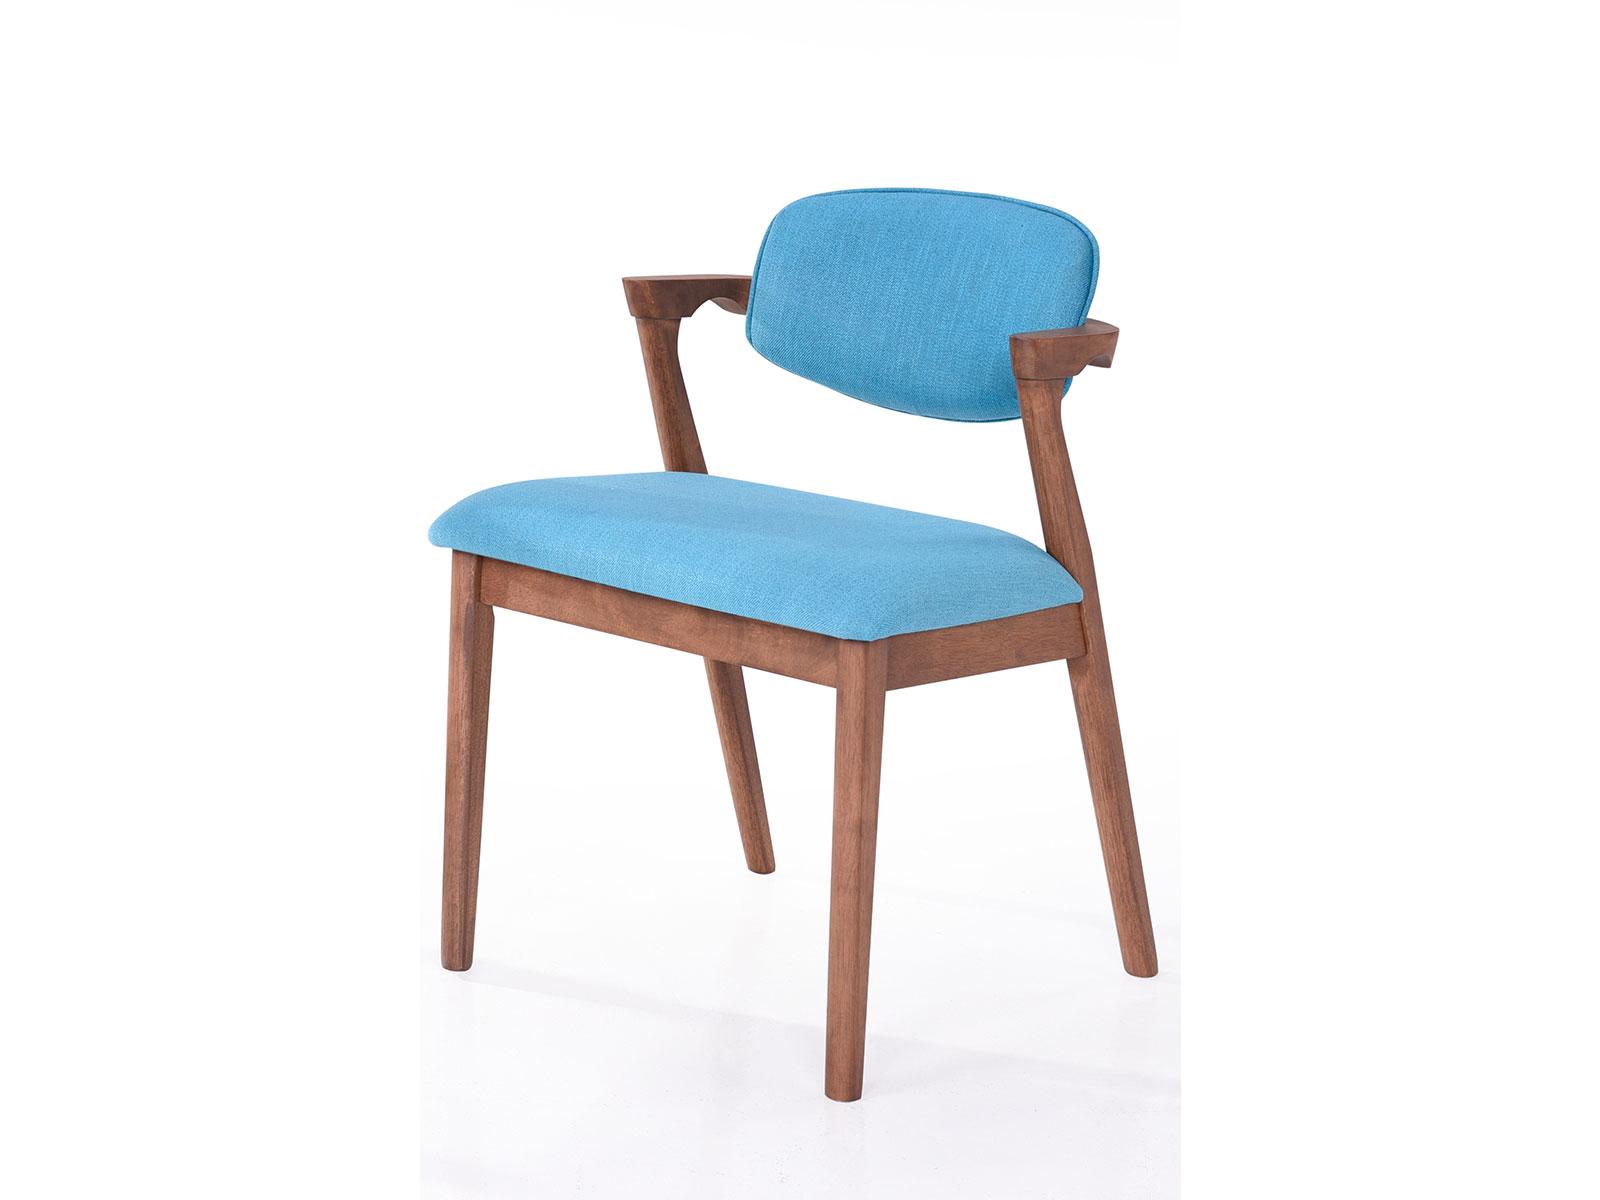 Scaun tapitat cu stofa water resistant Ivonne Blue l59xA55xH795 cm